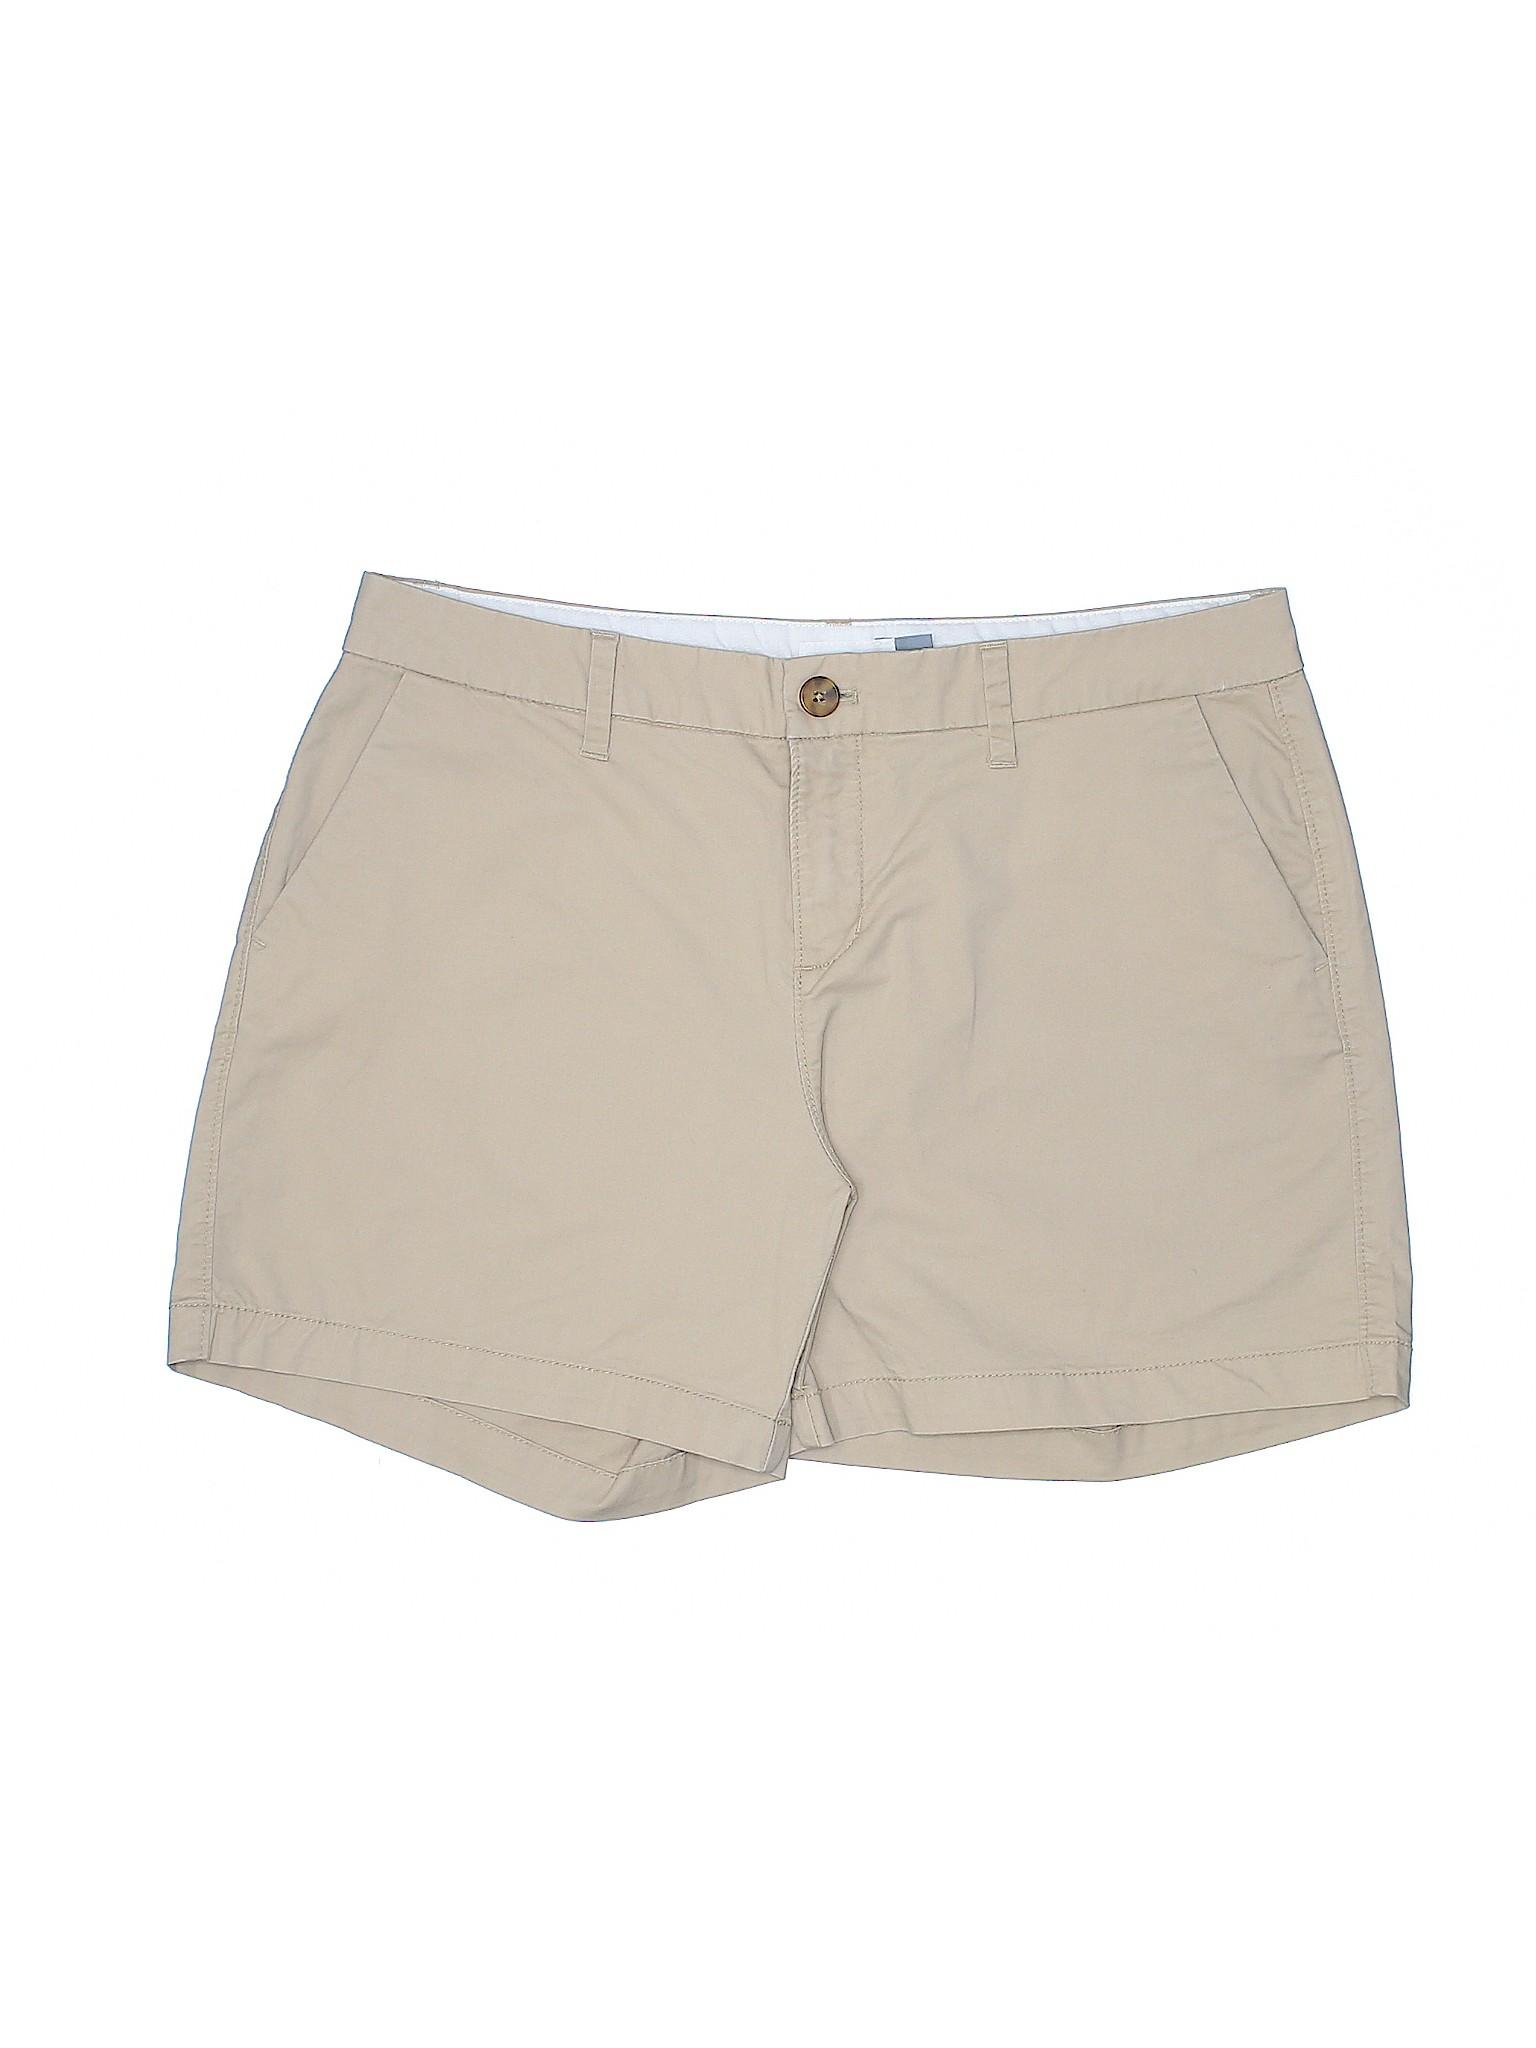 Leisure Old Khaki winter Shorts Navy 1SUpw8q